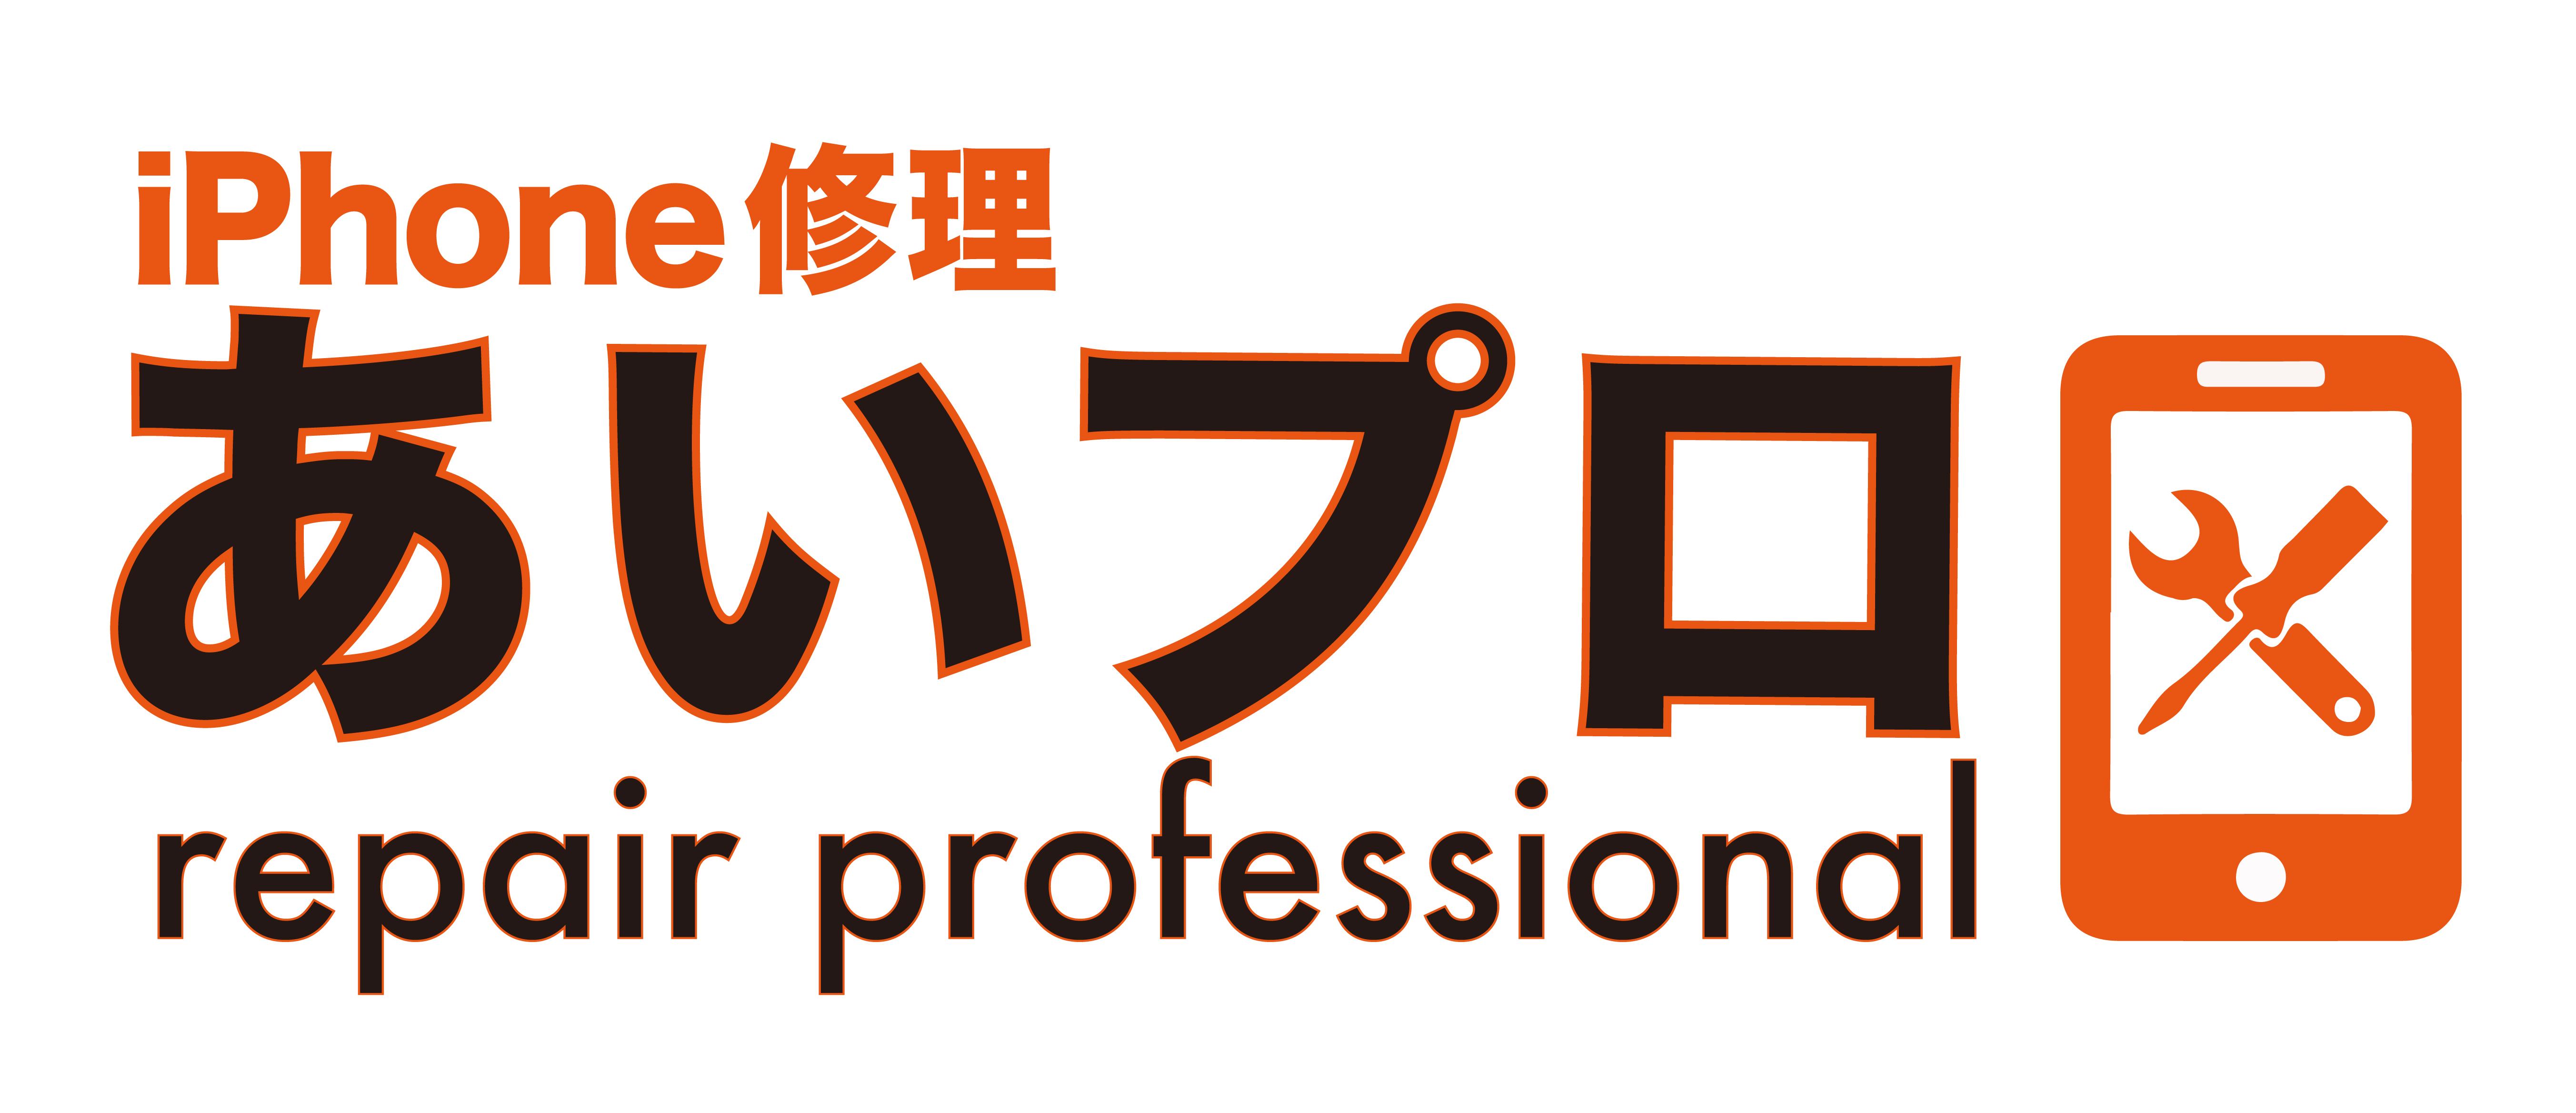 iphone修理専門店|iPhonePro-あいプロ-